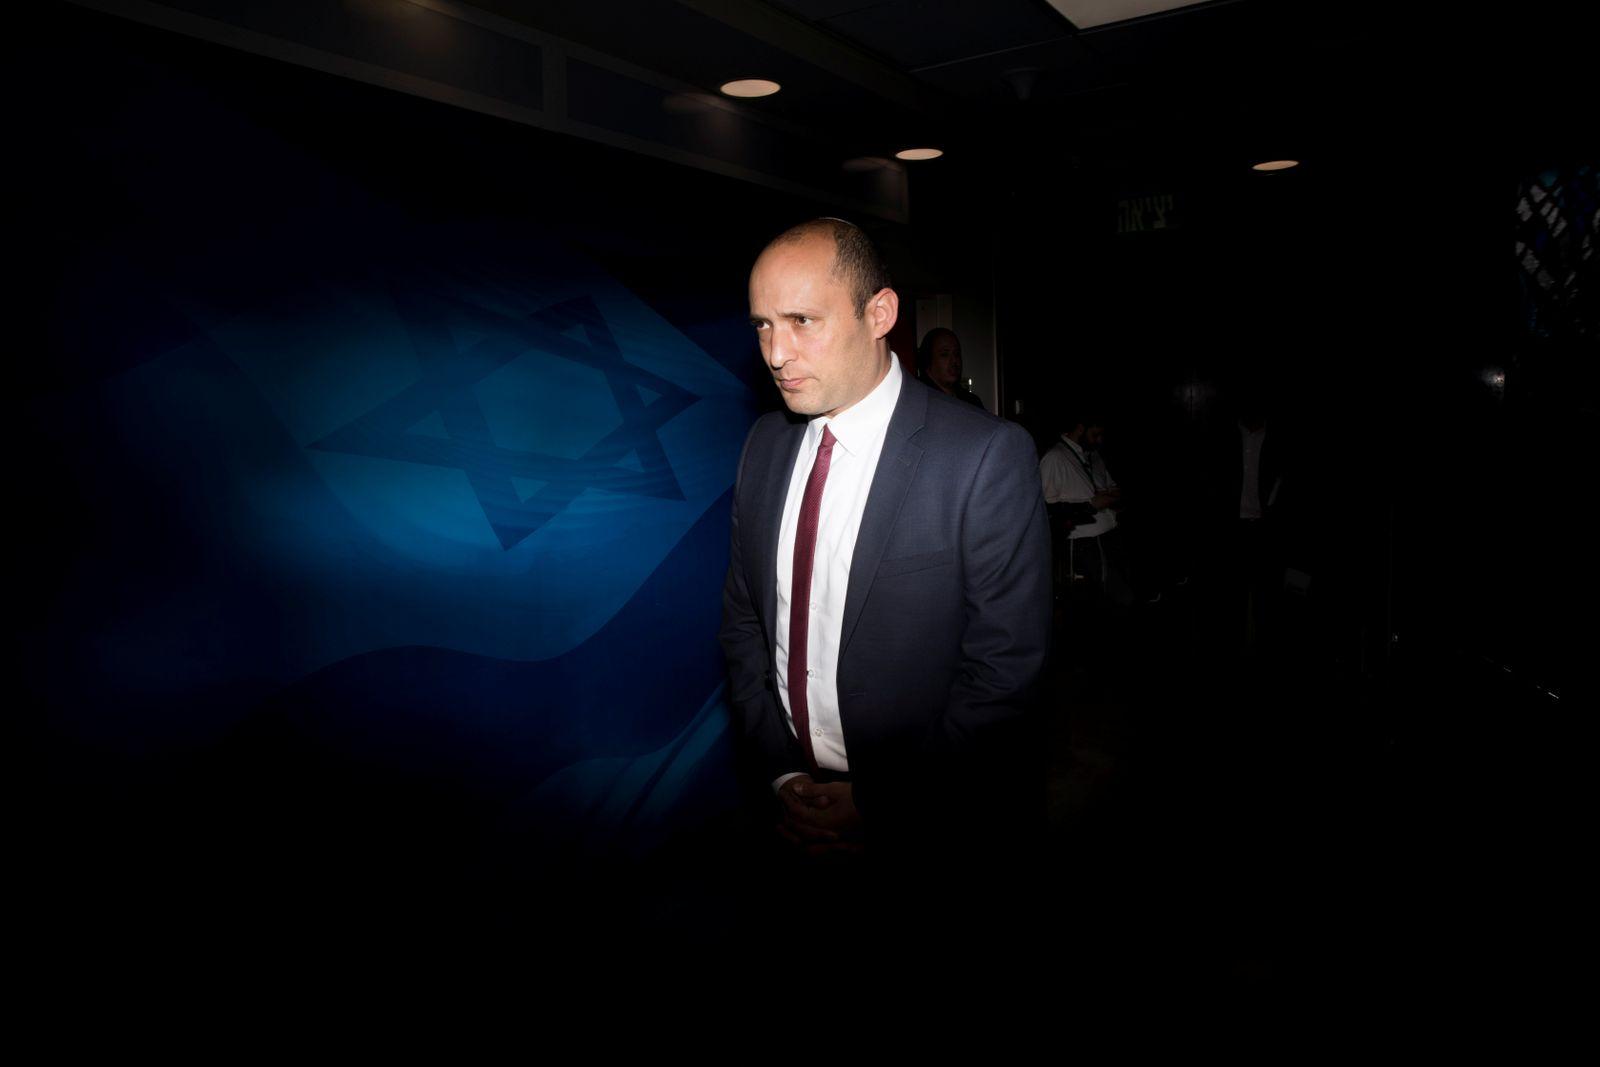 Israeli Education Minister Naftali Bennett attends the weekly cabinet meeting in Jerusalem